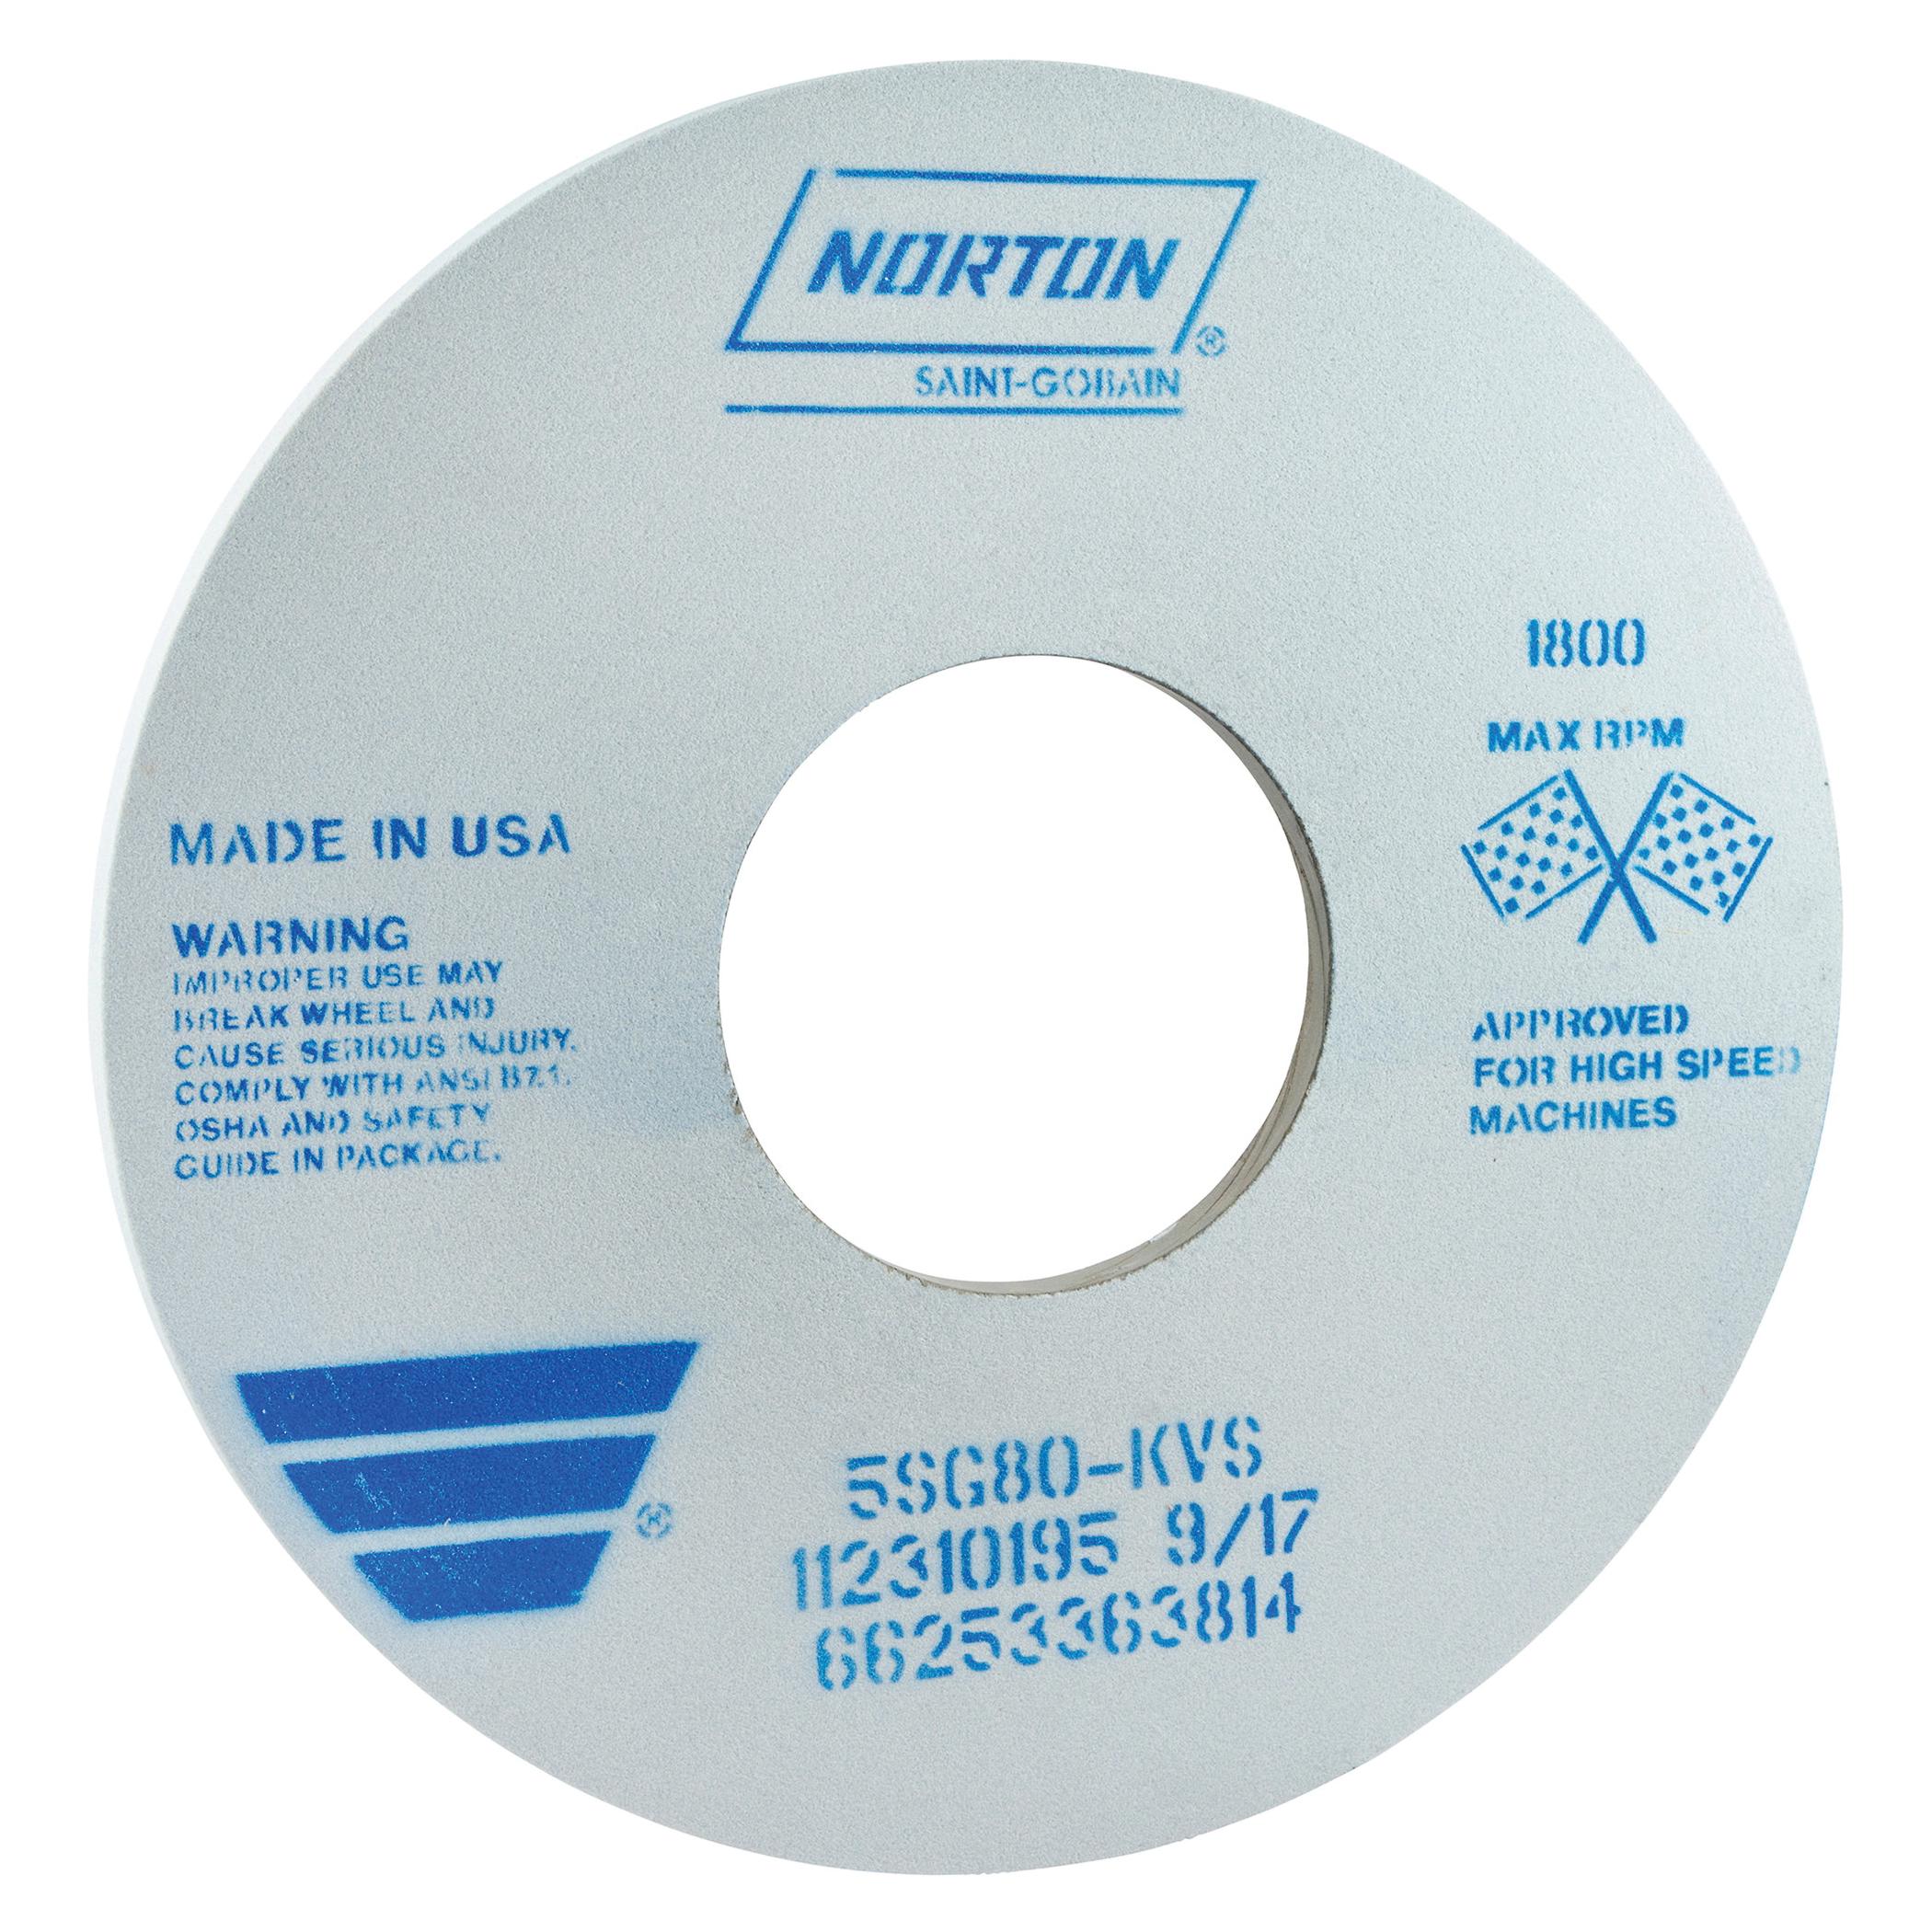 Norton® 66253363814 5SG Straight Toolroom Wheel, 14 in Dia x 1/2 in THK, 5 in Center Hole, 80 Grit, Ceramic Alumina/Friable Aluminum Oxide Abrasive